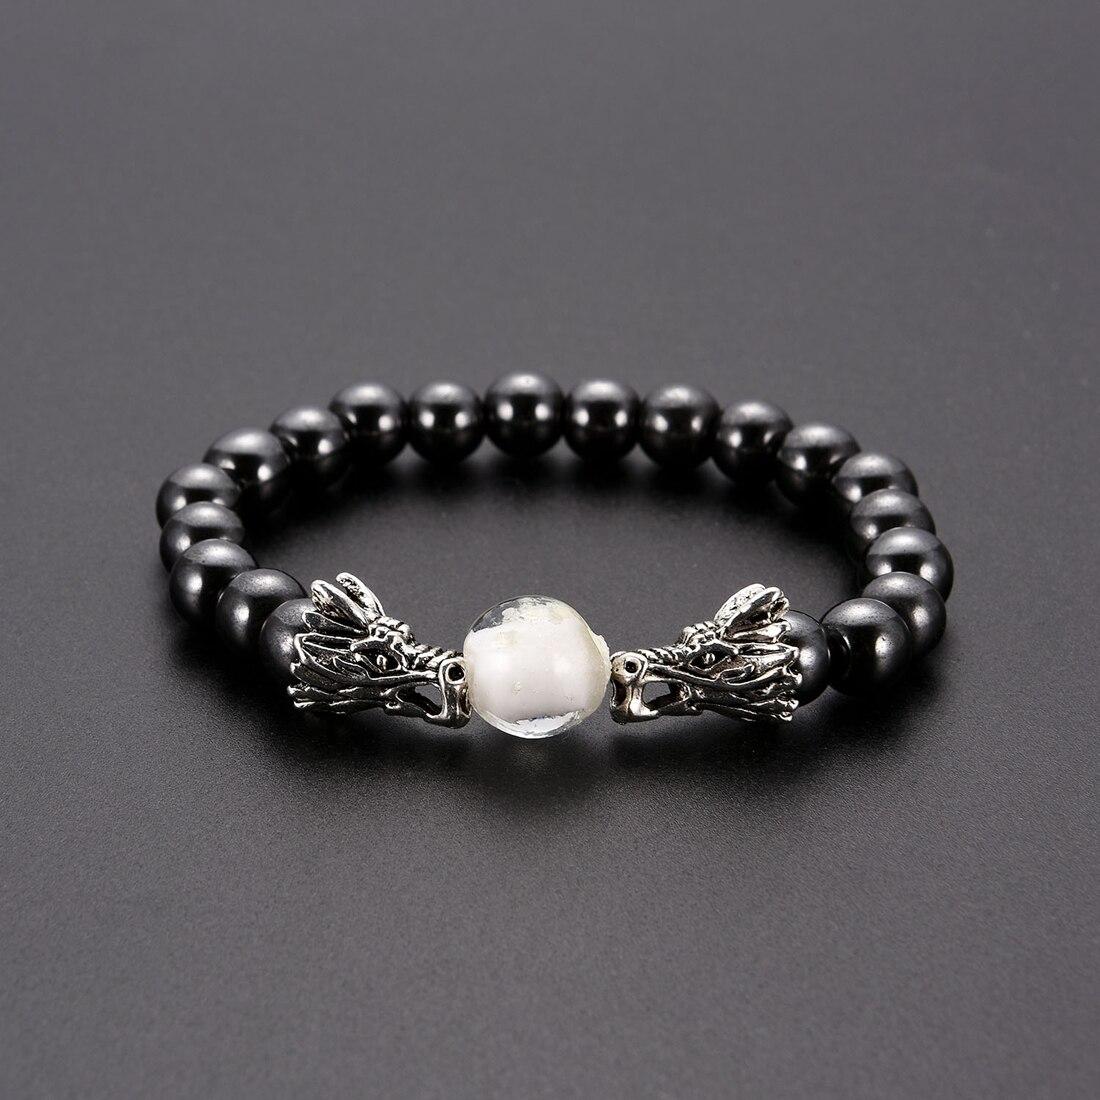 Fashion Beaded Bracelet Natural Lava Stone Hematite Charms Natural Stone Bracelets Black Beads Owl Bracelets